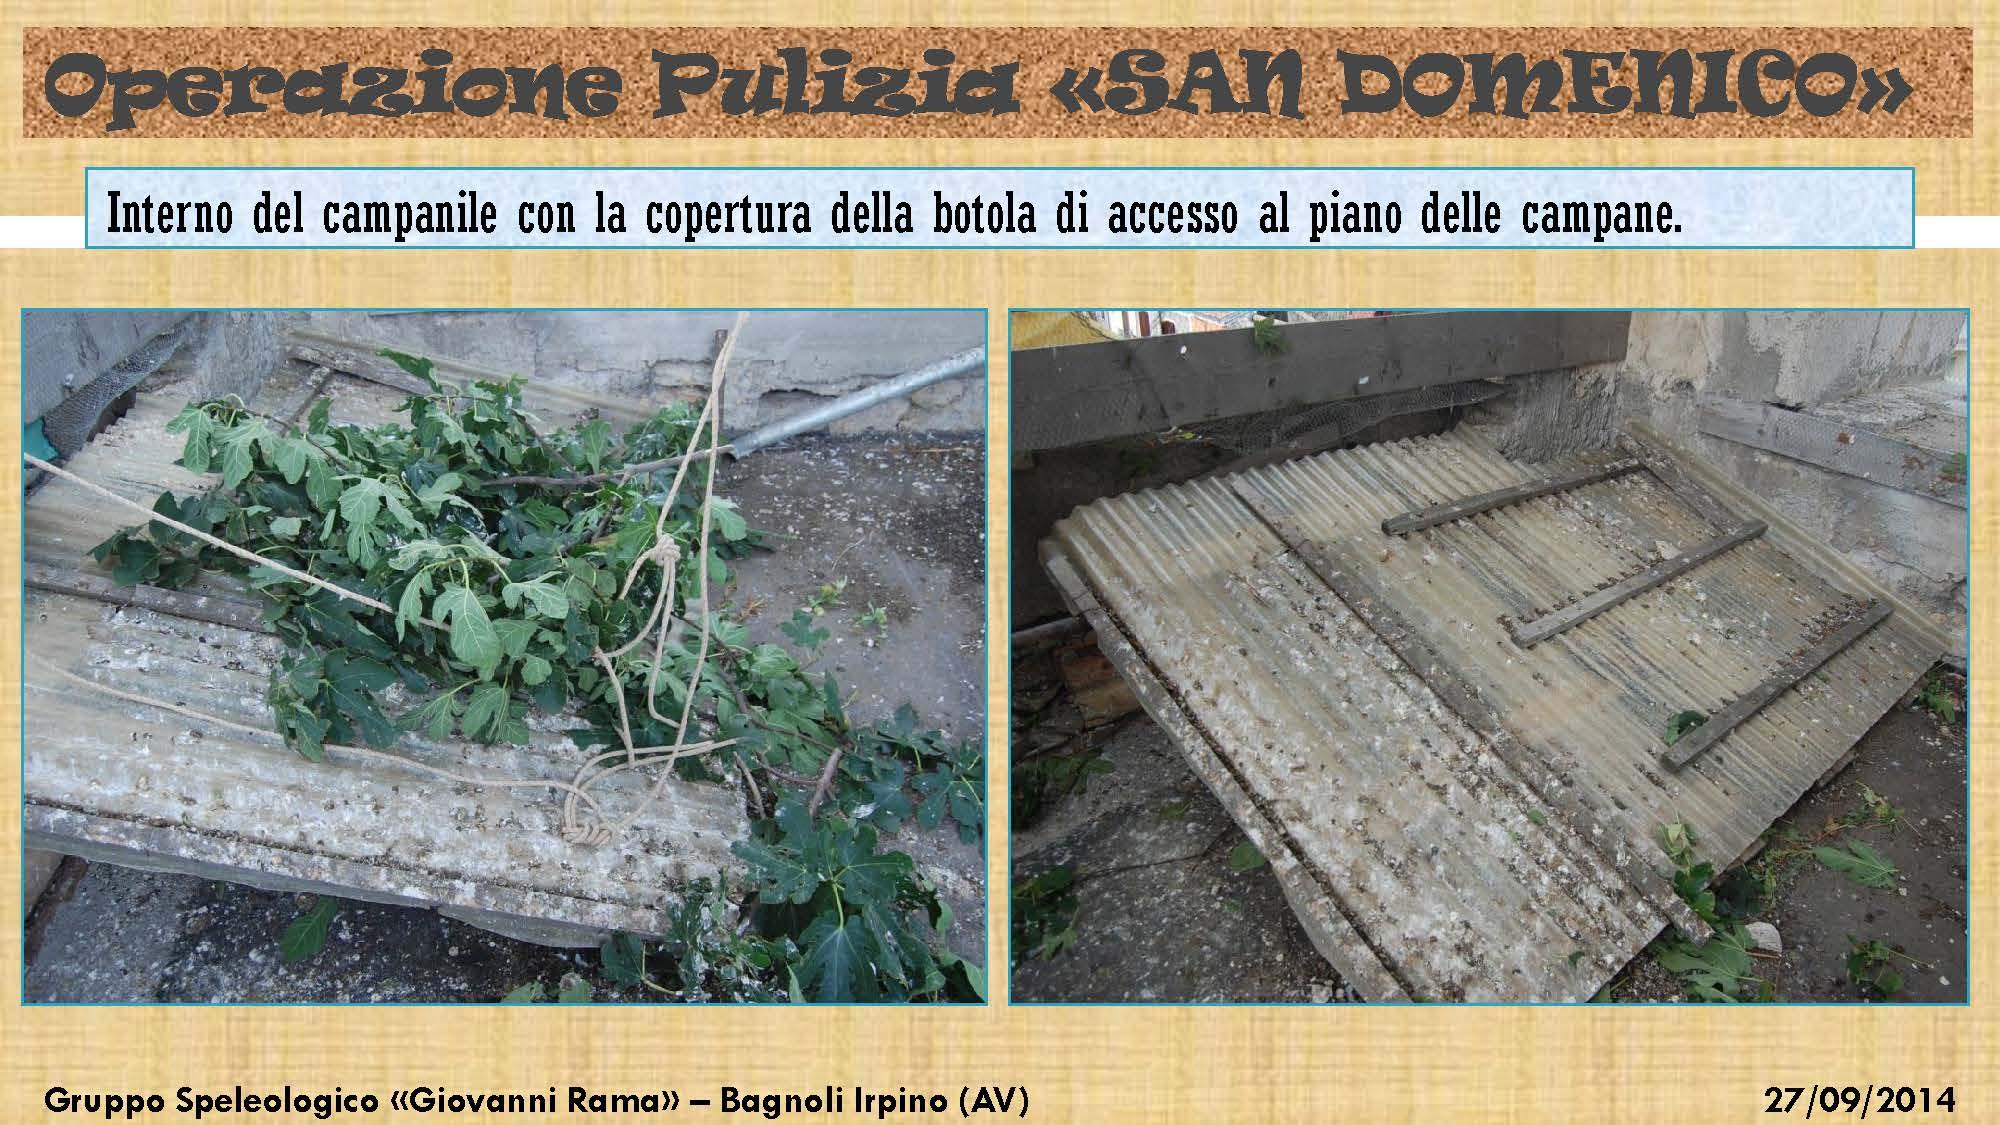 Bagnoli-Pulizia-San-Domenico-2014_Pagina_21